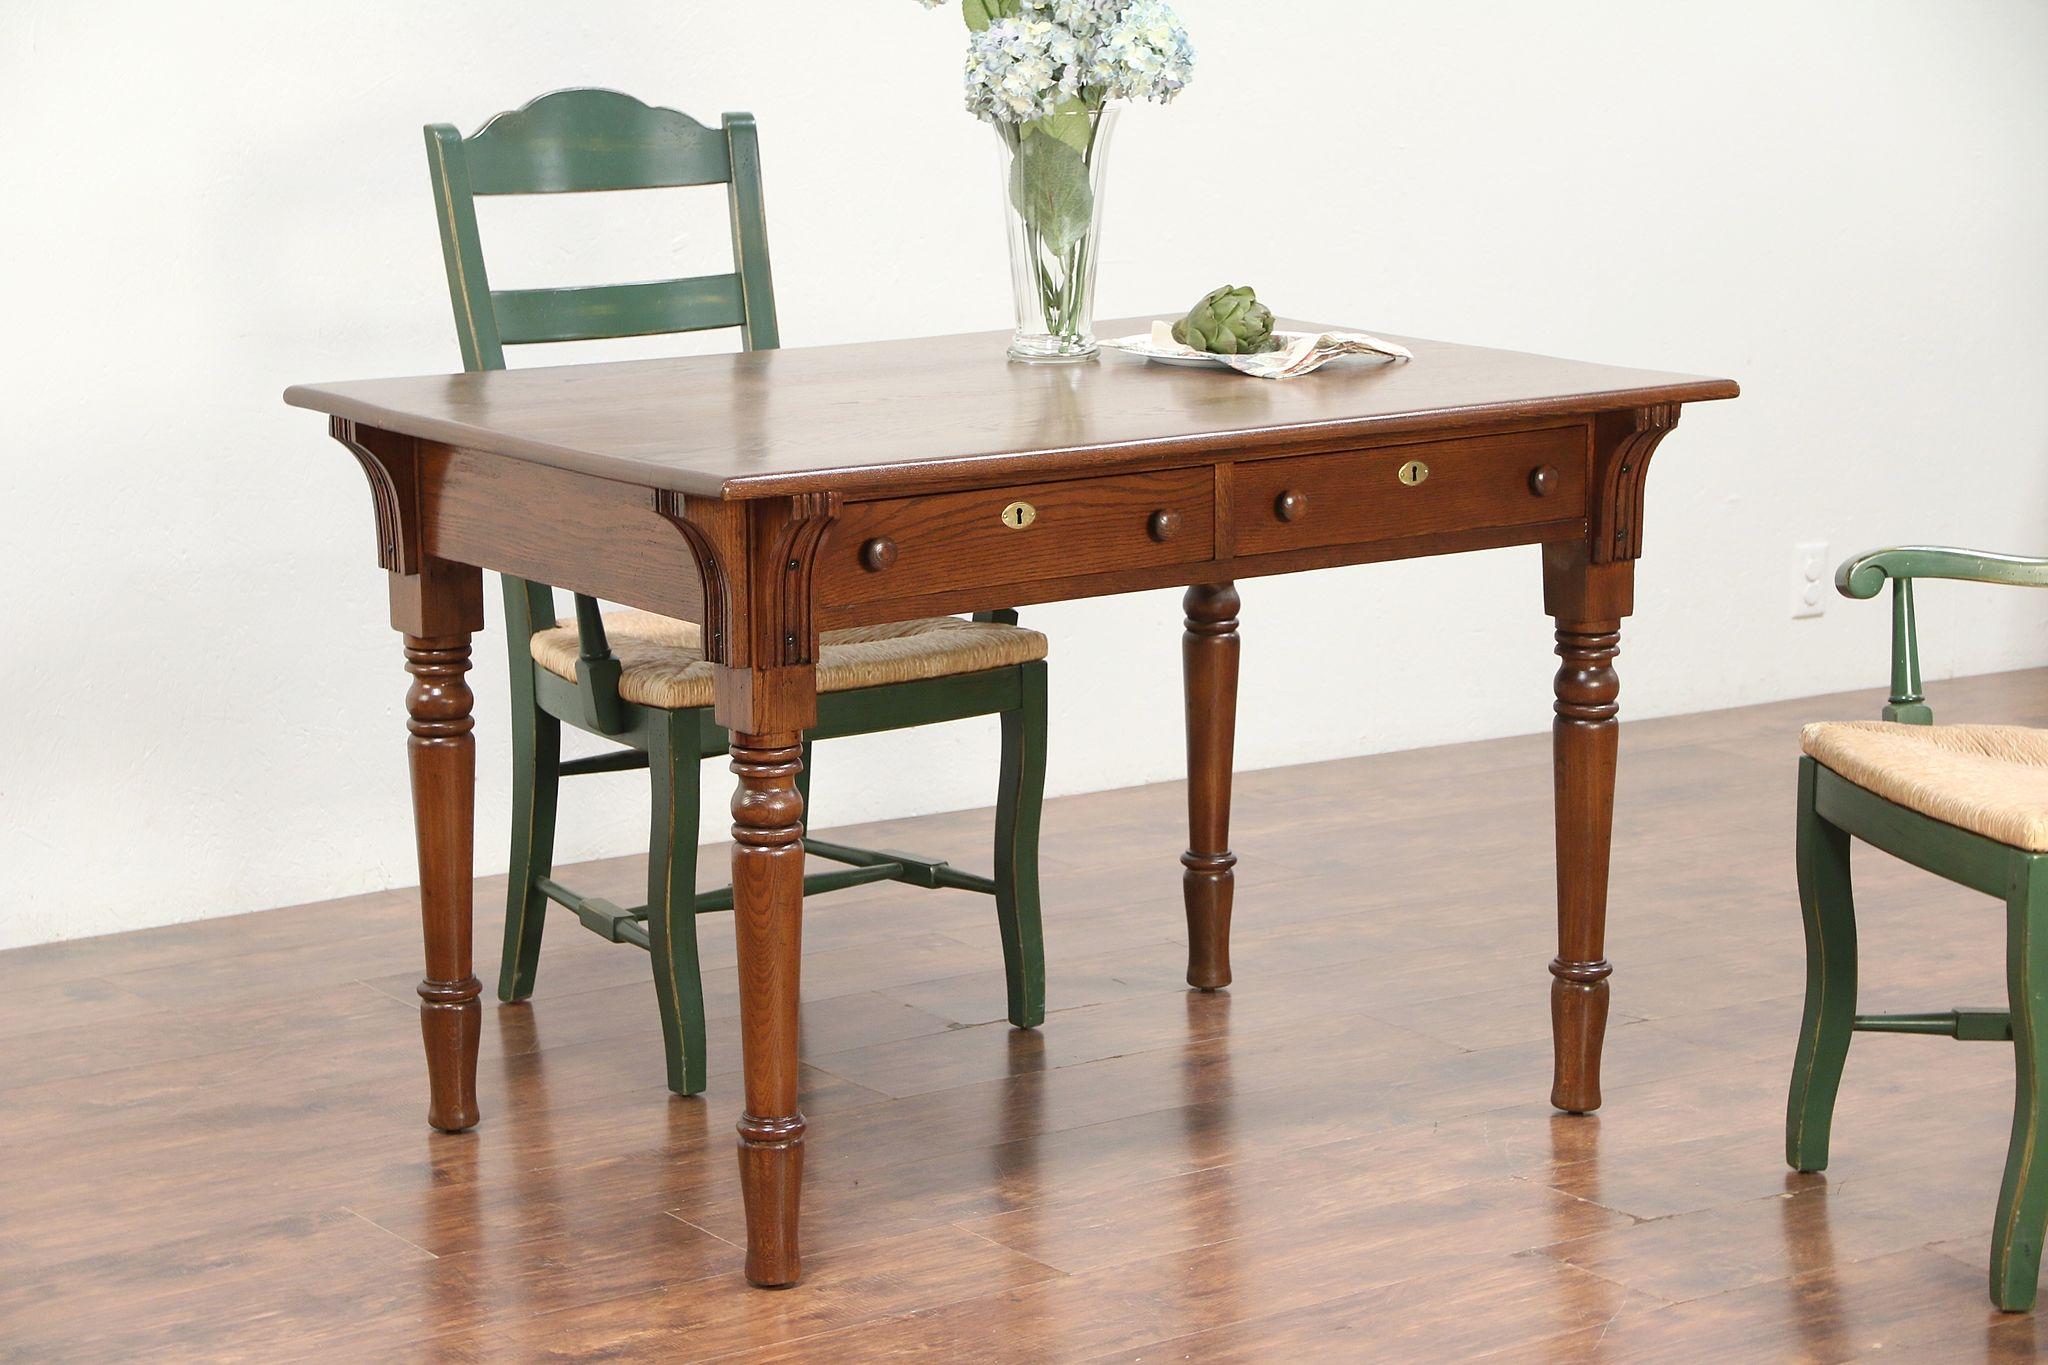 Fabulous Victorian Eastlake Antique Oak Library Table Desk Or Kitchen Table 29552 Download Free Architecture Designs Scobabritishbridgeorg